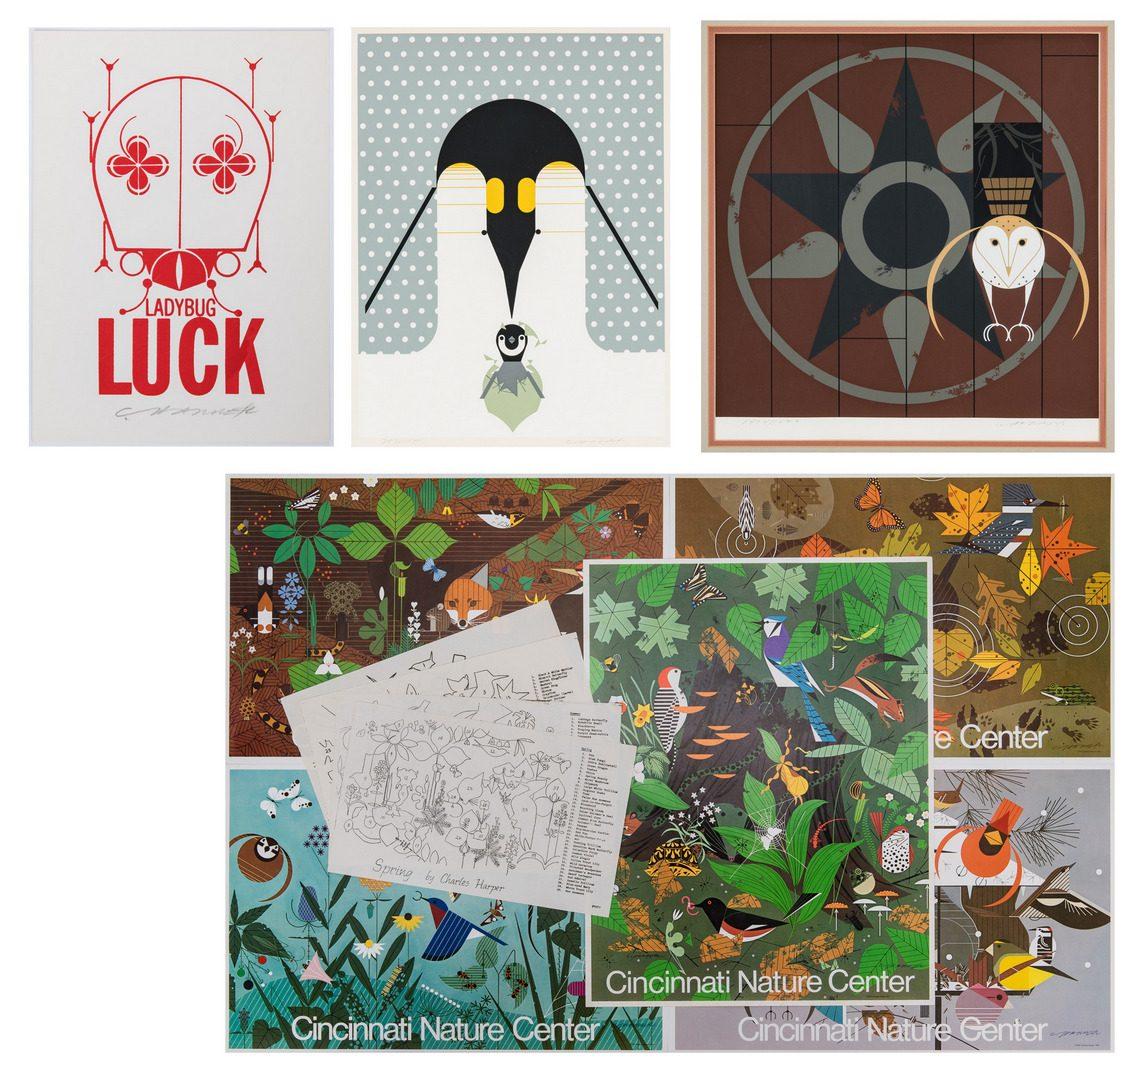 Lot 547: 2 Charley Harper Serigraphs, 5 Posters & more